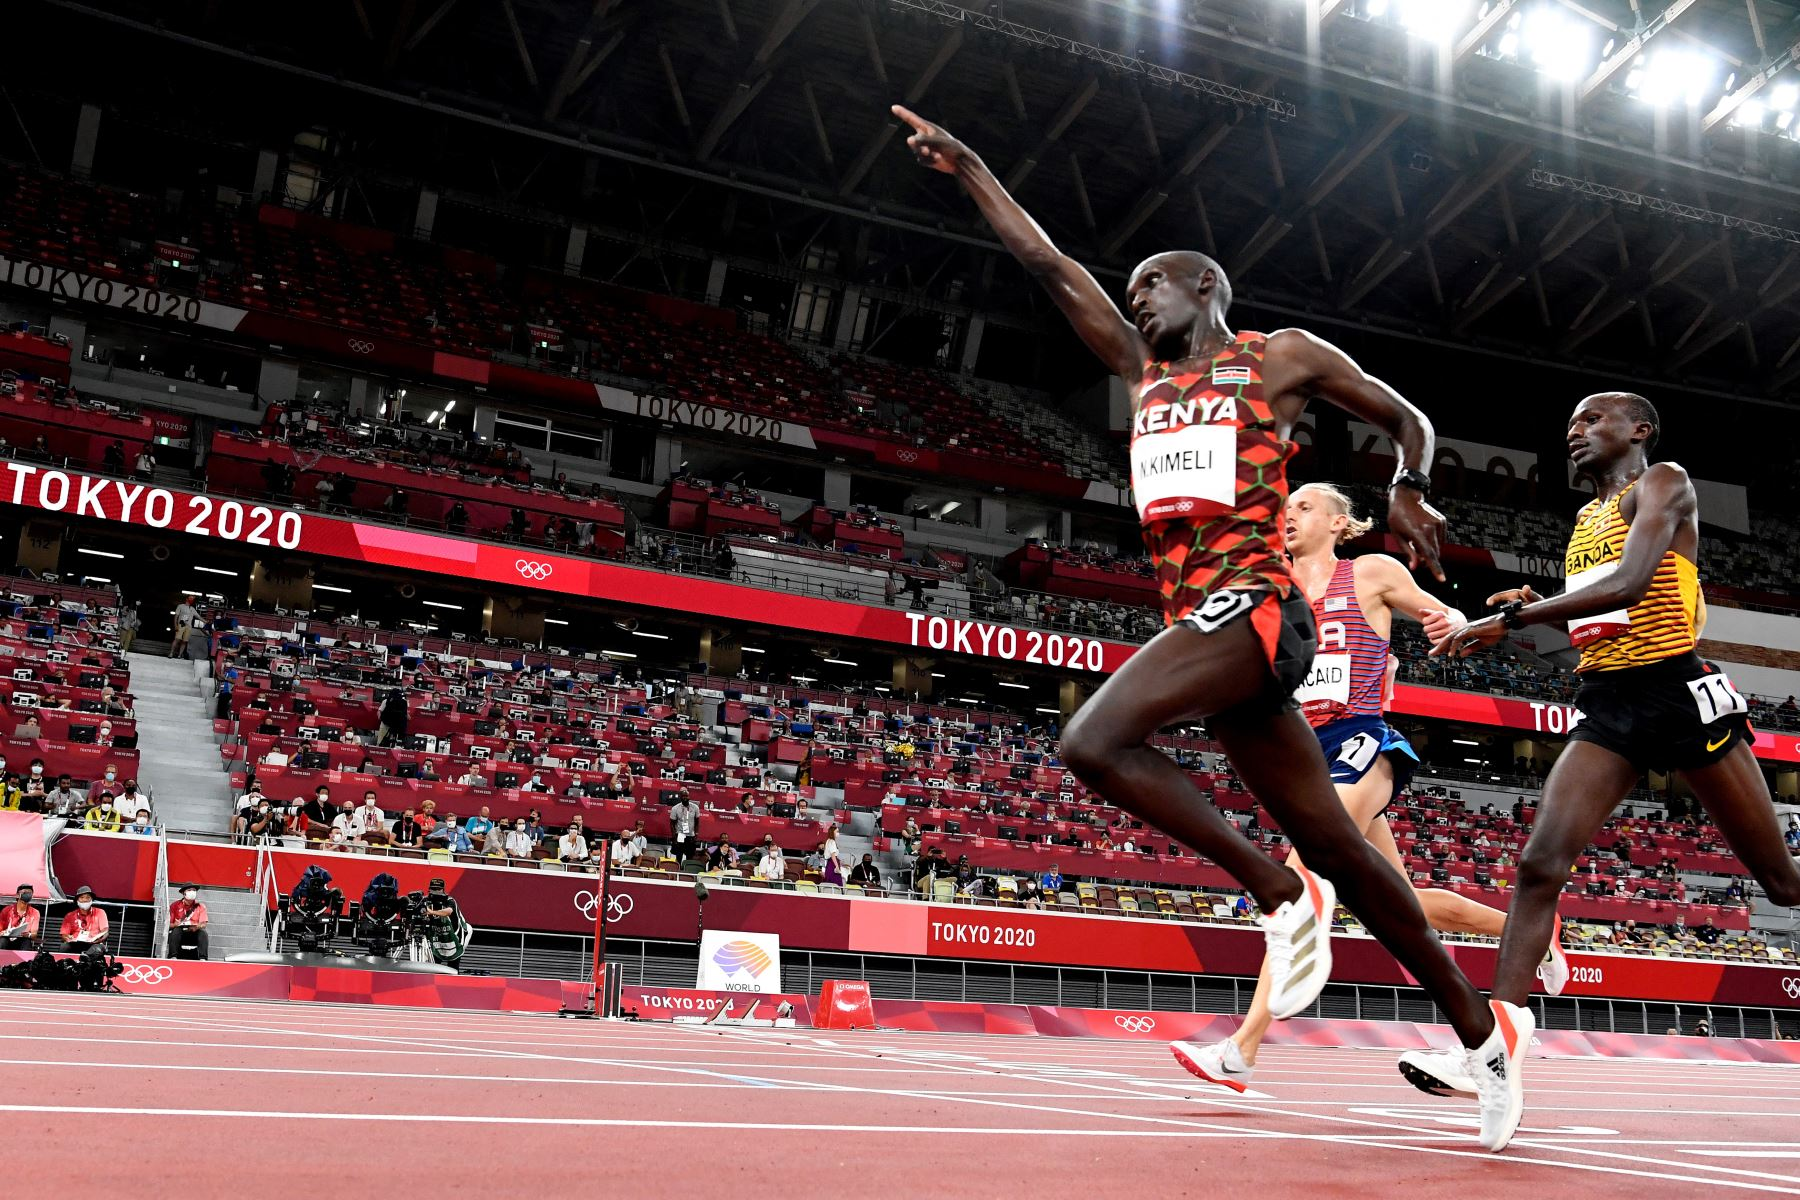 Nicholas Kipkorir Kimeli de Kenia gana las eliminatorias masculinas de 5000m durante los Juegos Olímpicos de Tokio 2020.  Foto: AFP